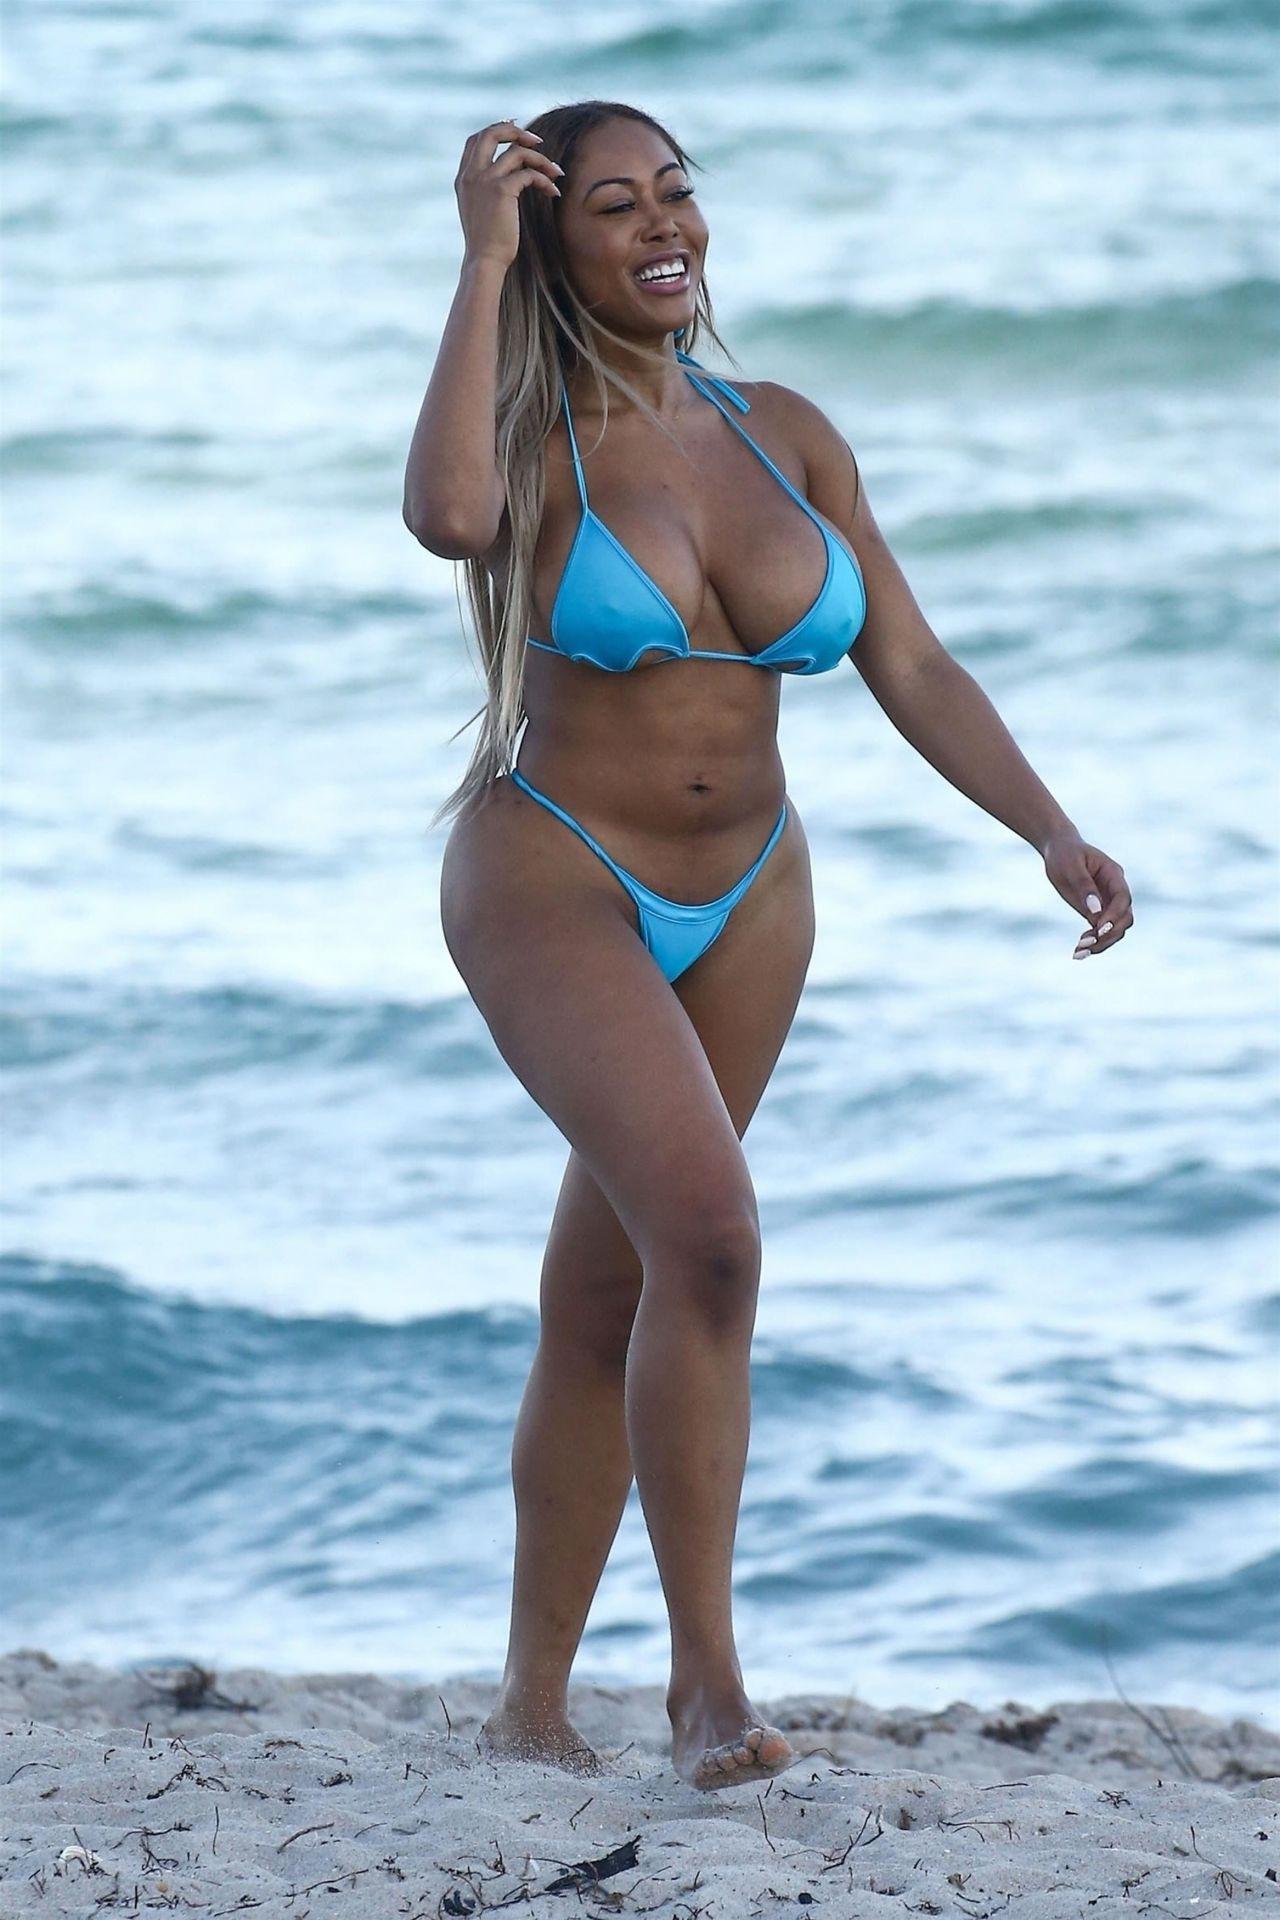 Moriah Mills in Bikini Photoshoot on the beach in Miami Pic 24 of 35